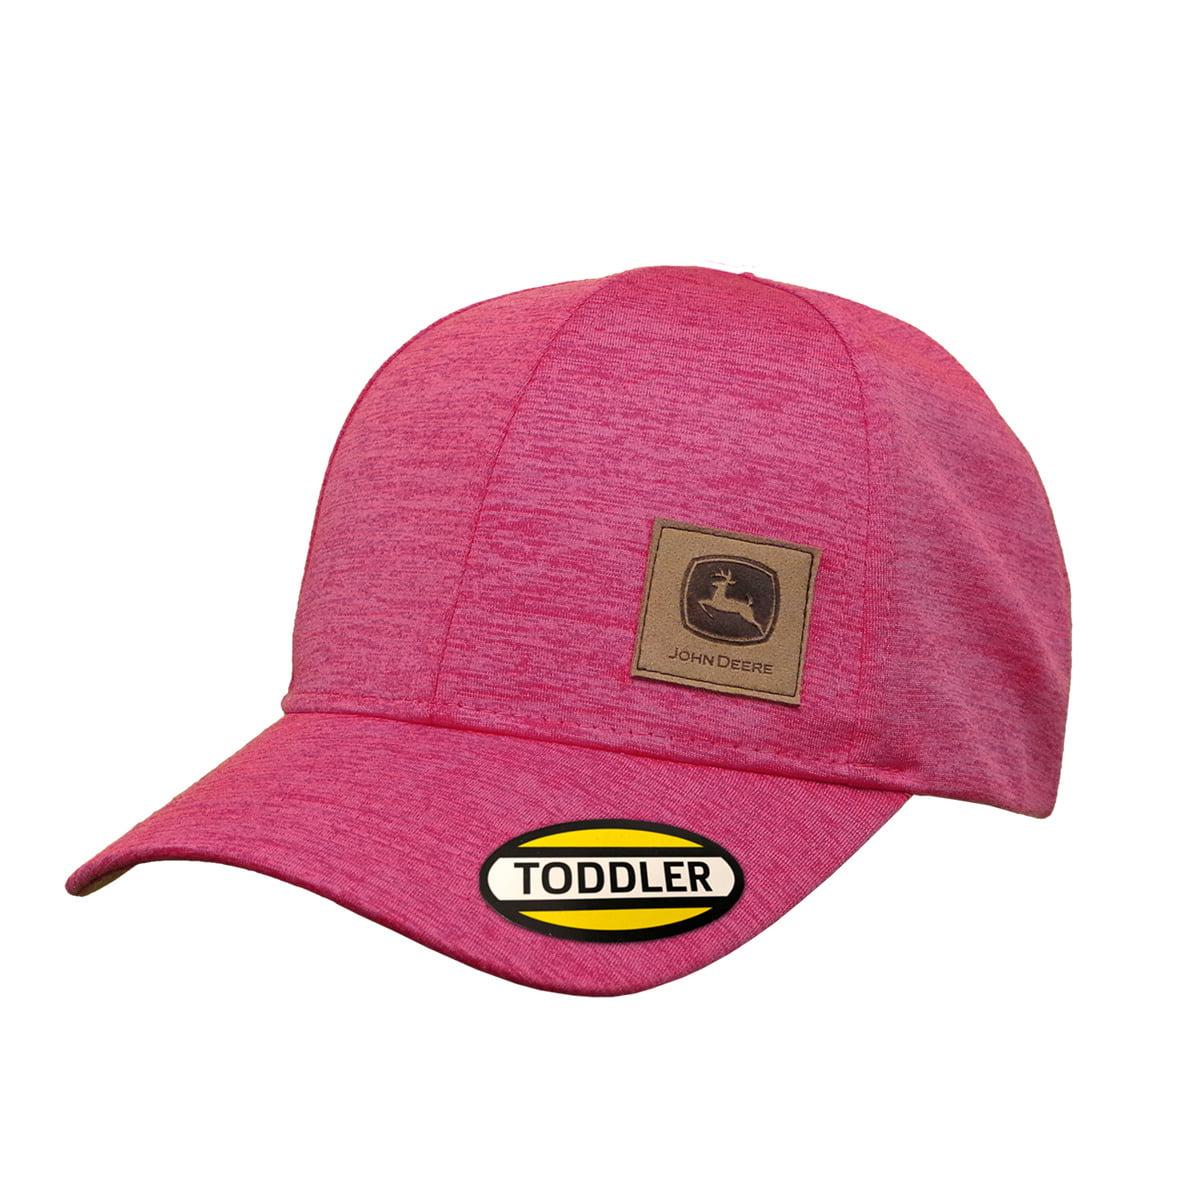 One Size Fits All, Pink  John Deere Cap